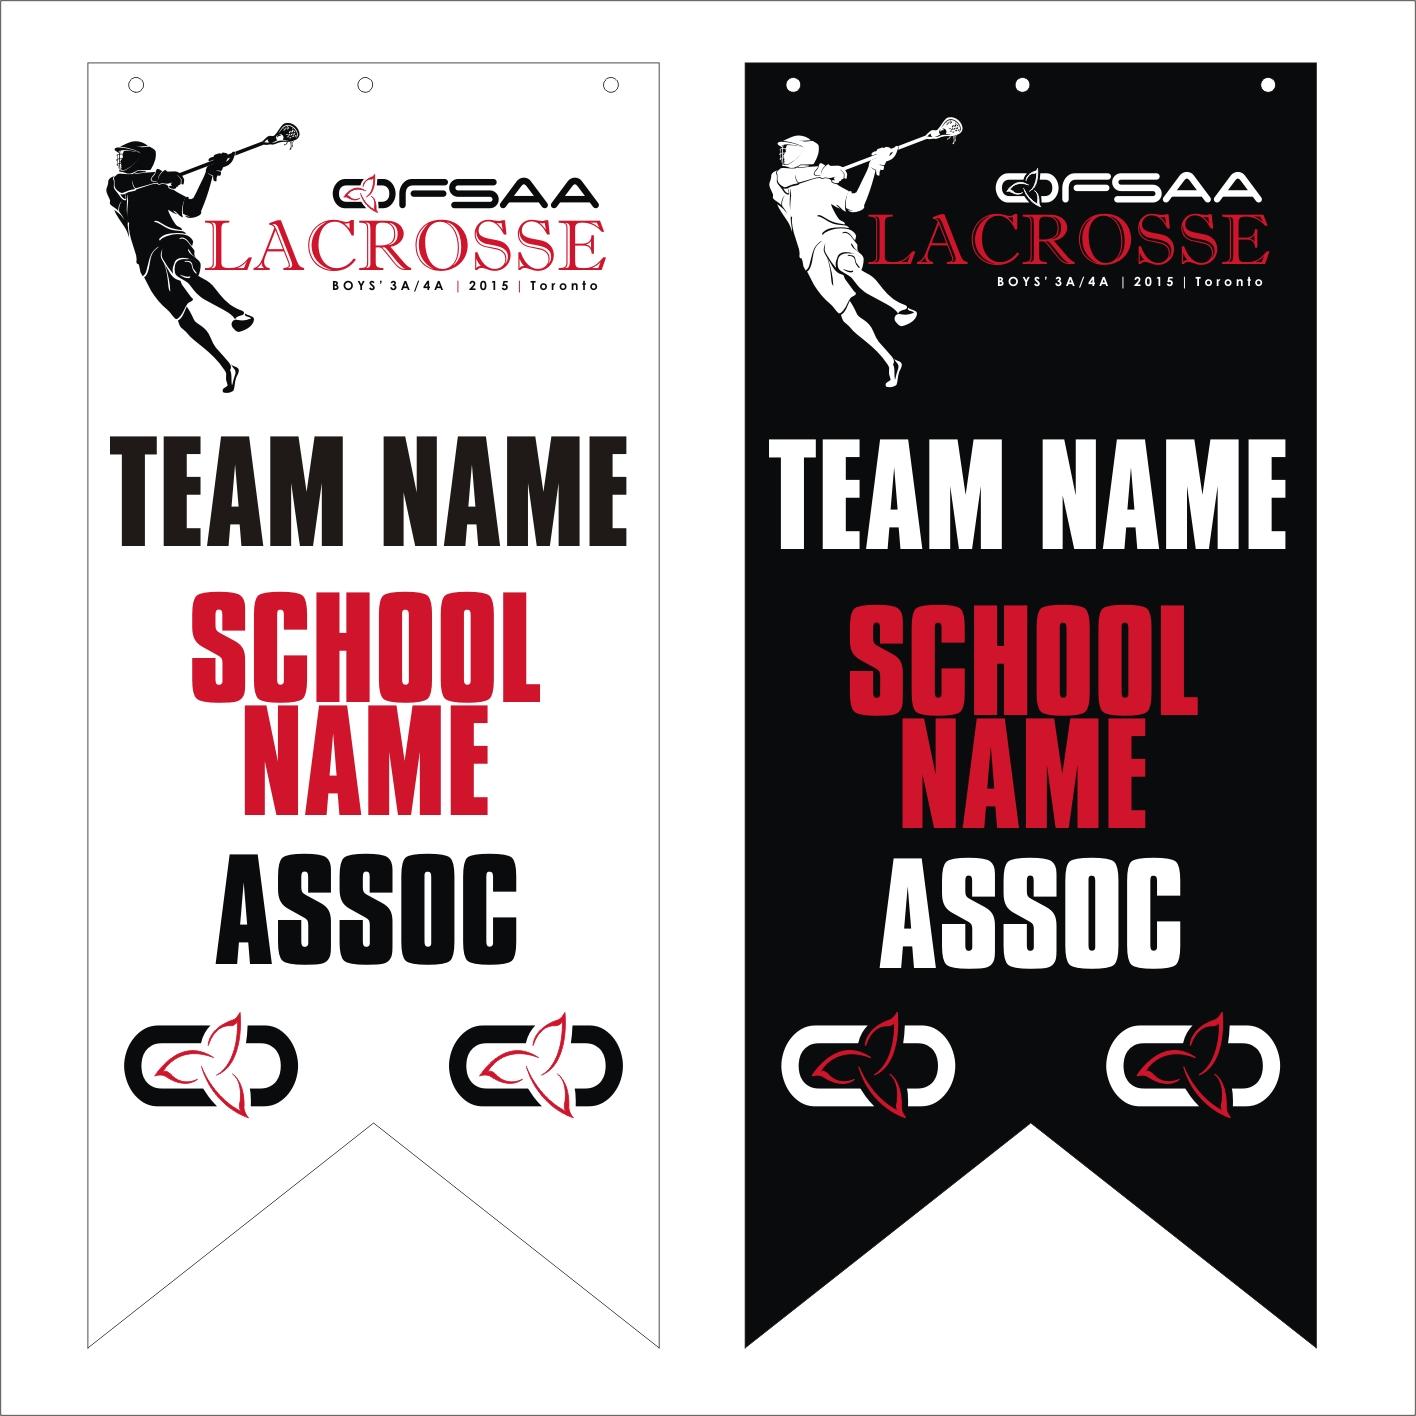 2015 Boys 3A 4A Lacrosse Banner.jpg